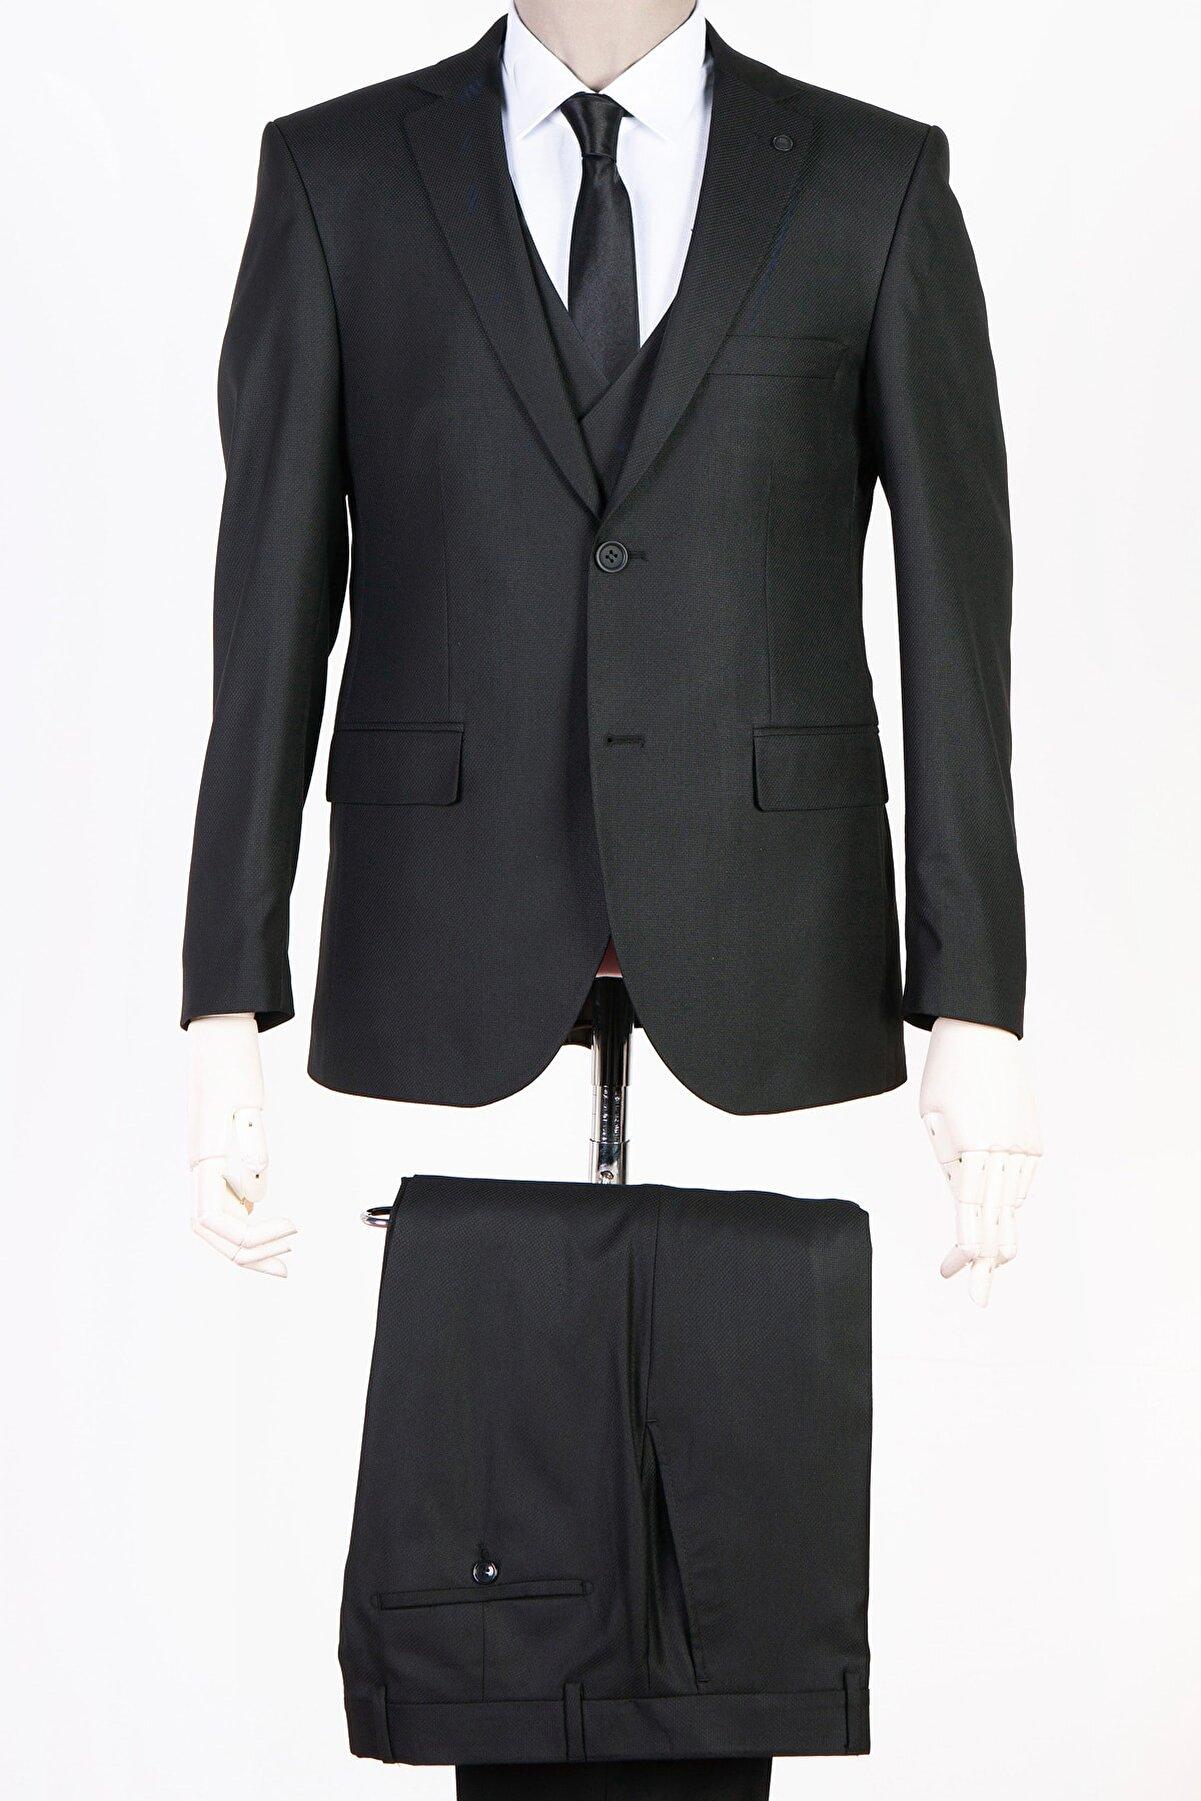 RAMMEN Siyah Slim Fit Dar Kesim Takım Elbise